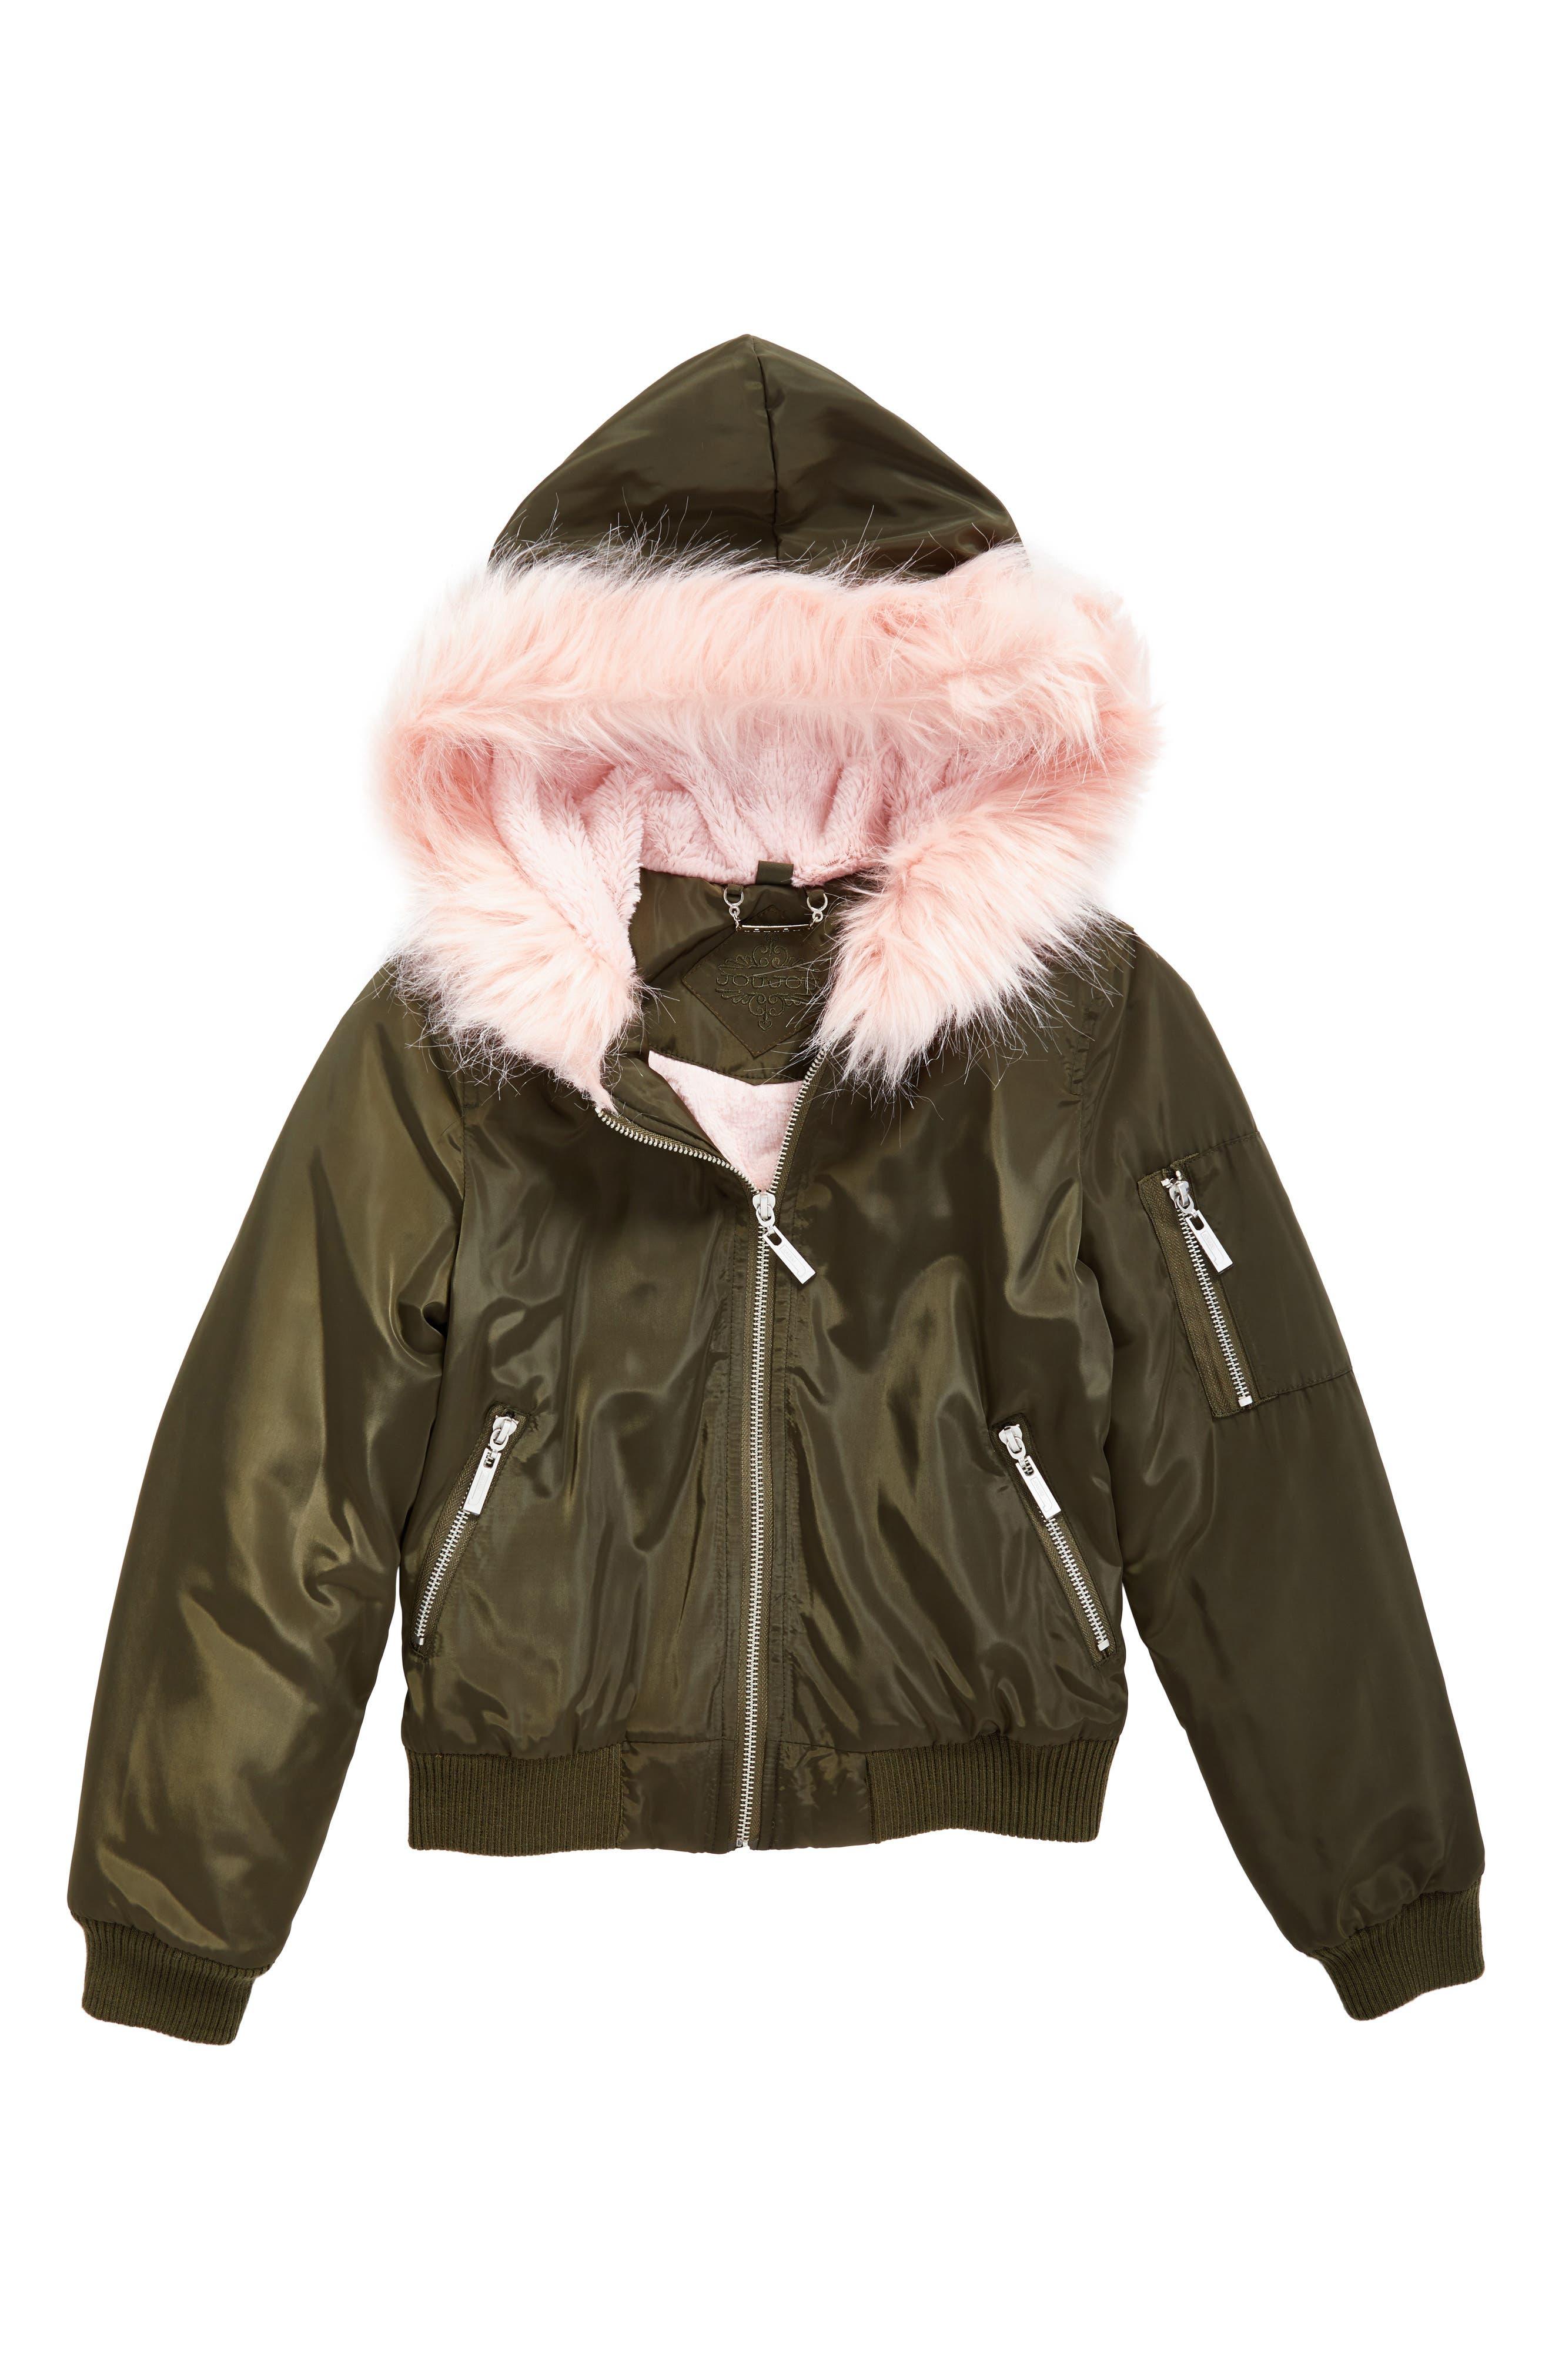 Main Image - Jou Jou Hooded Bomber Jacket with Faux Fur Trim (Big Girls)